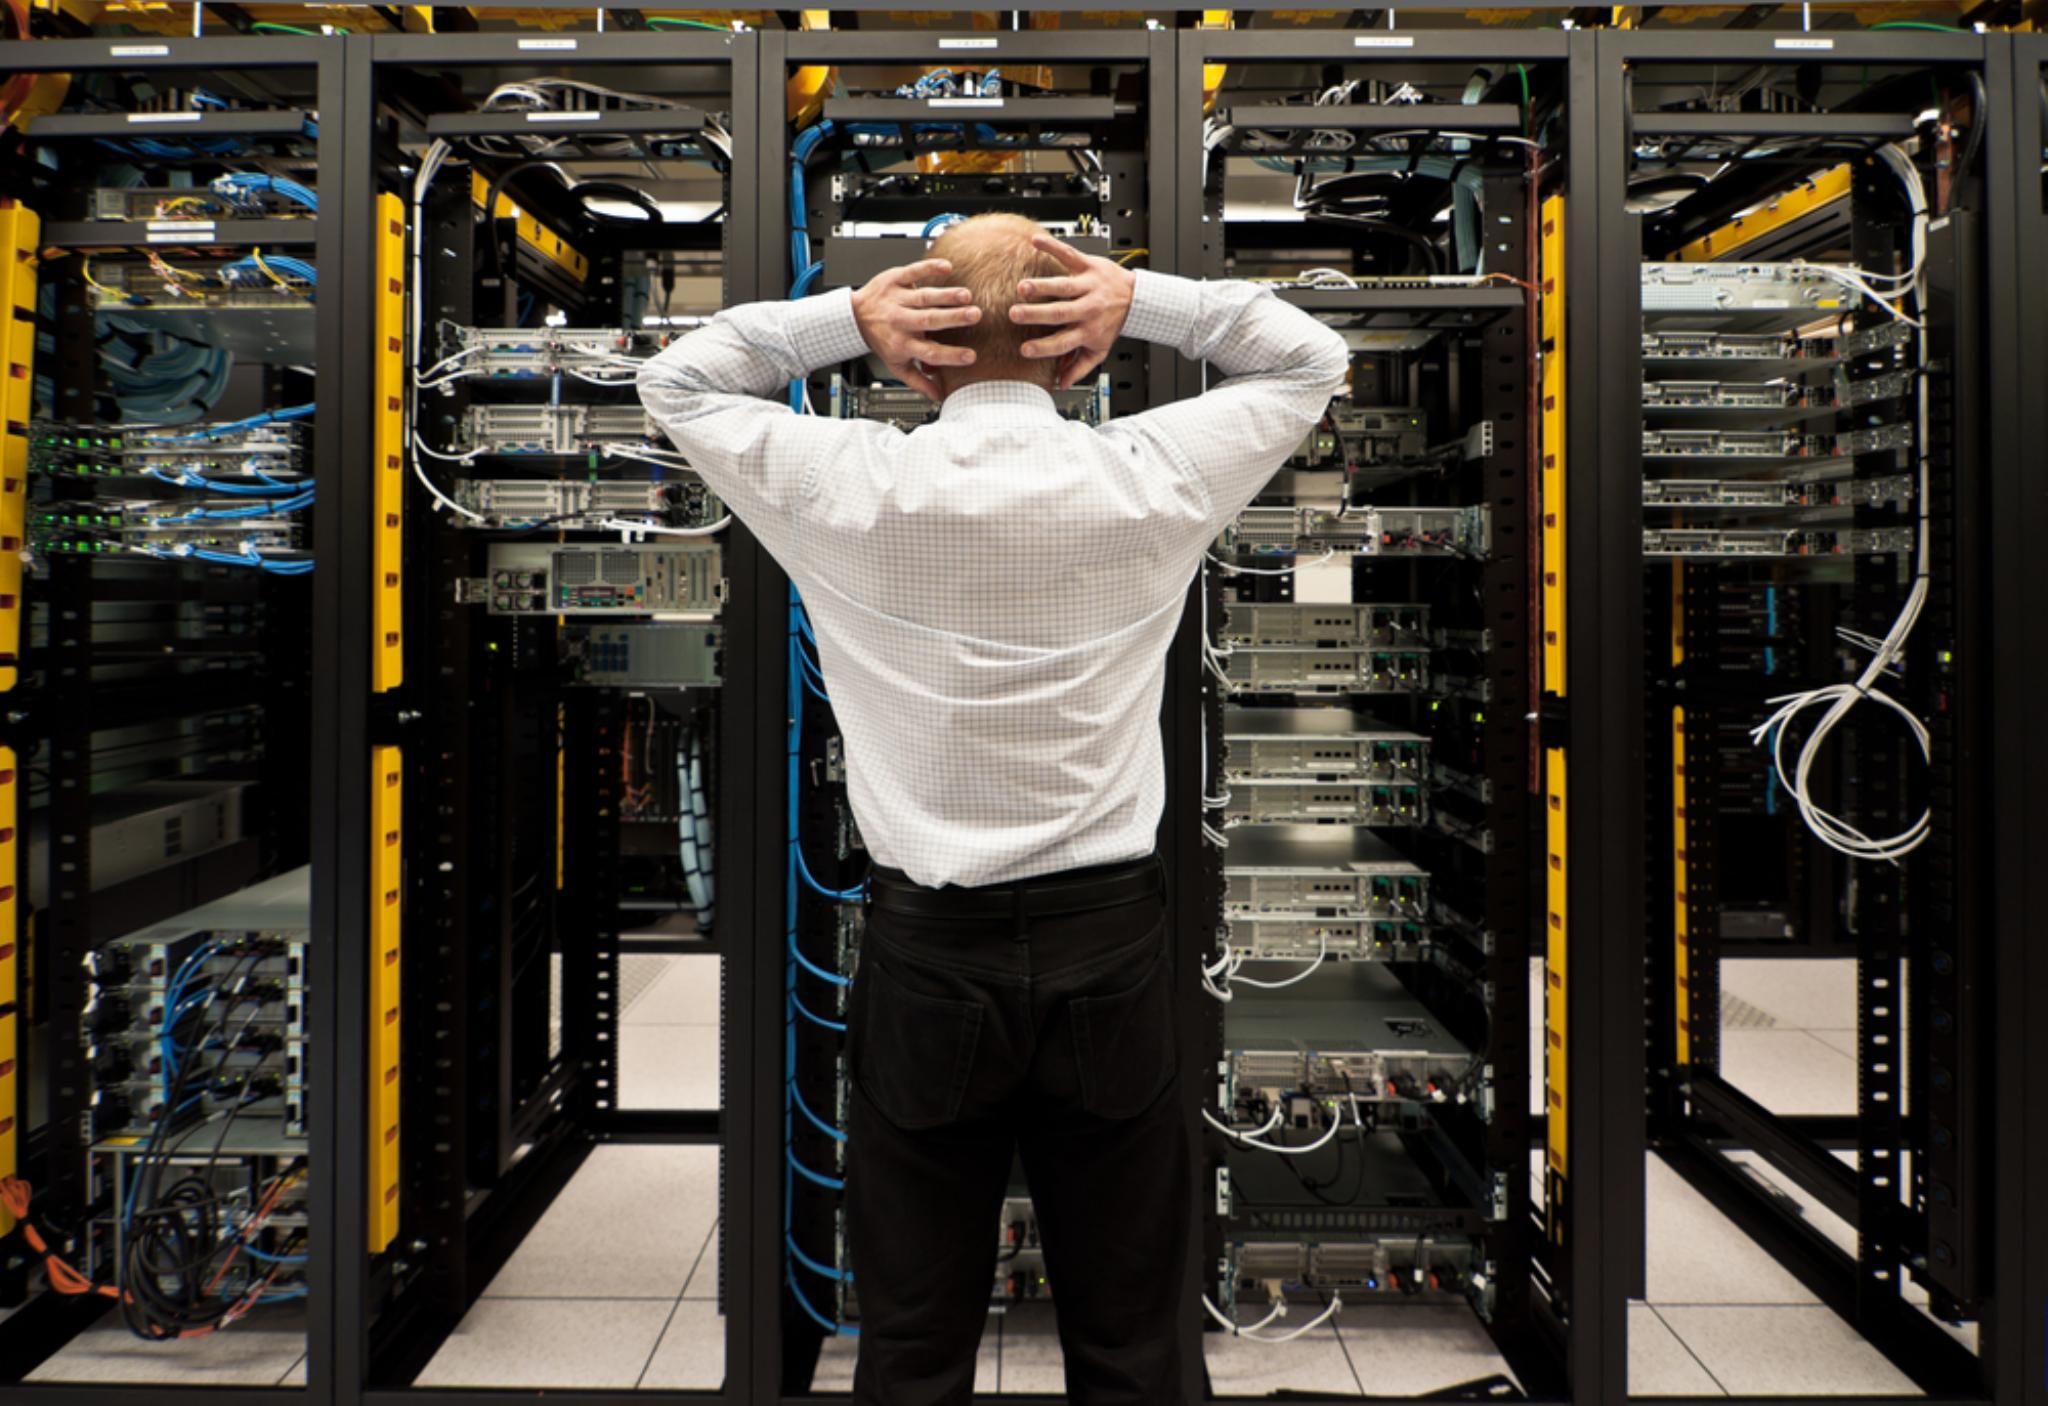 Critical Chicago Data Center